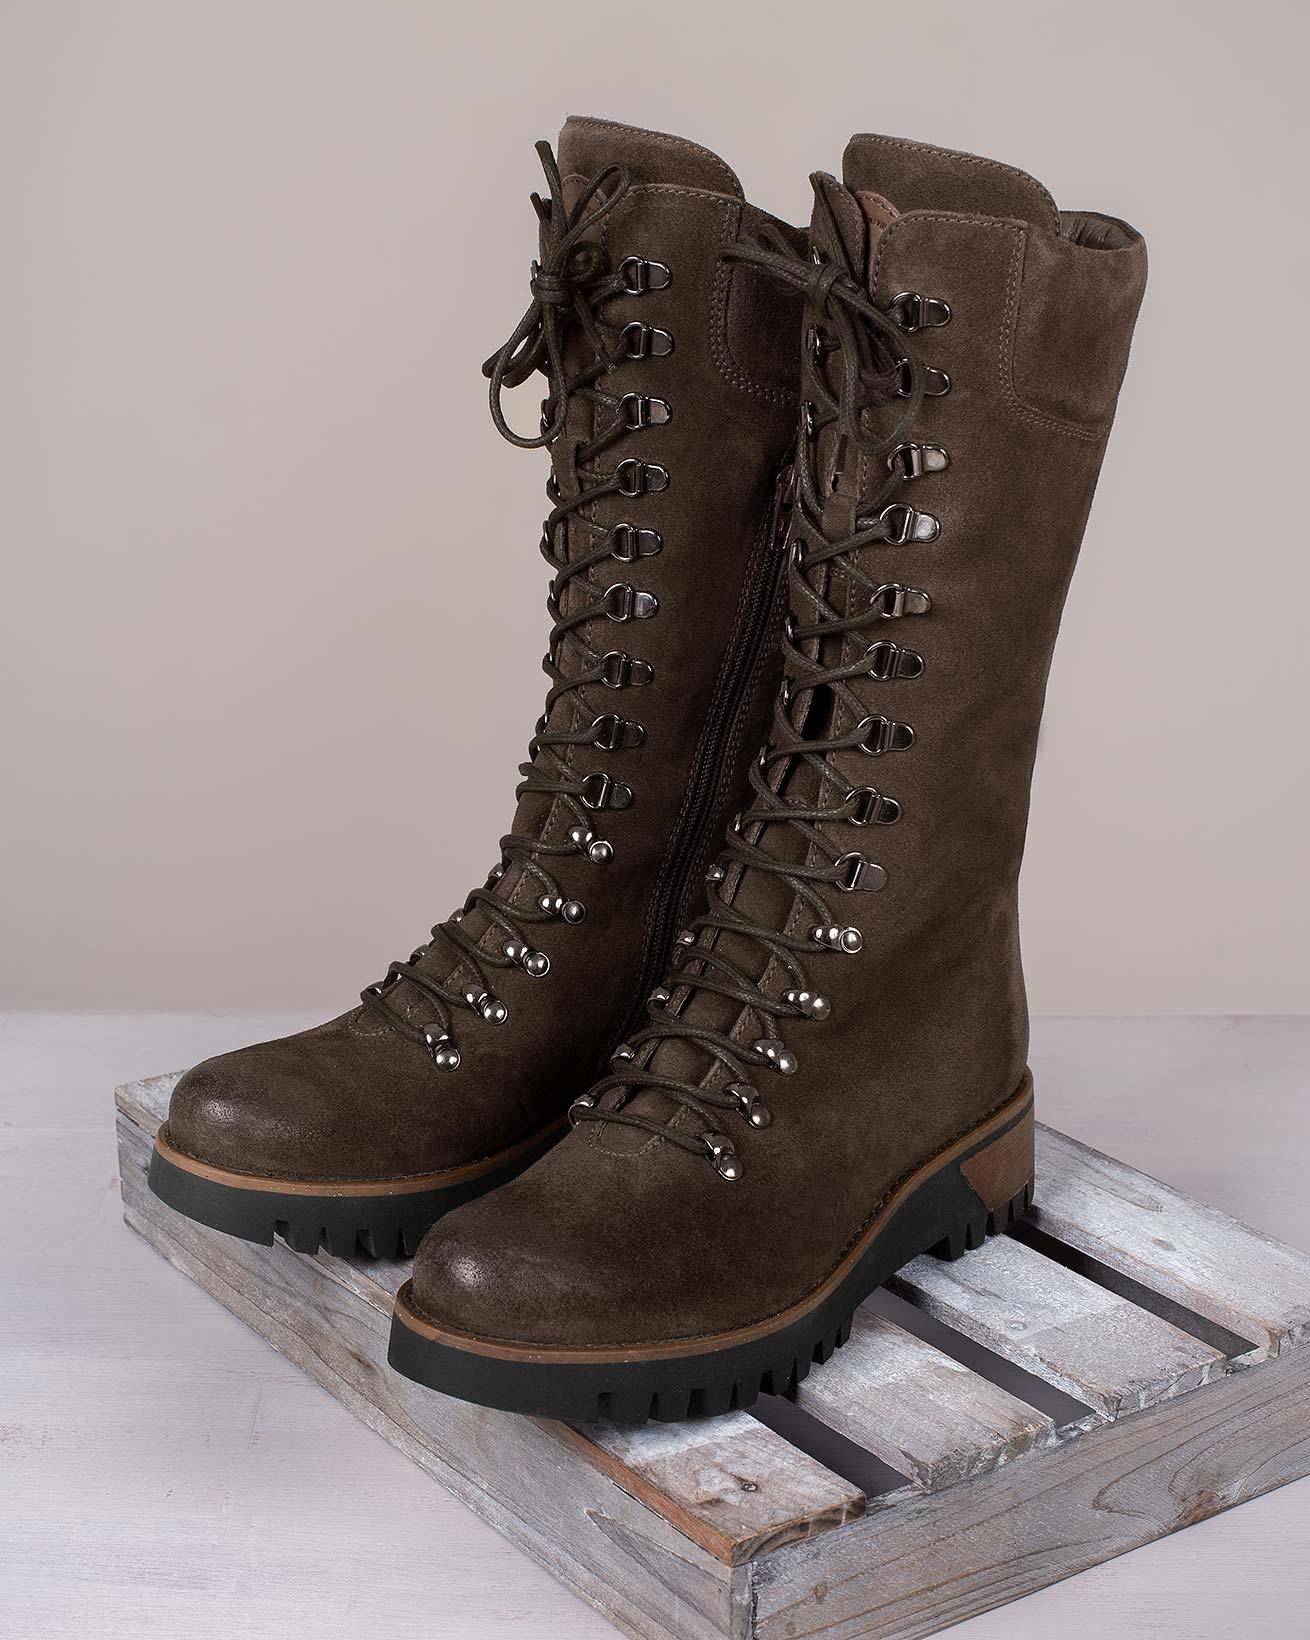 Wilderness Boots